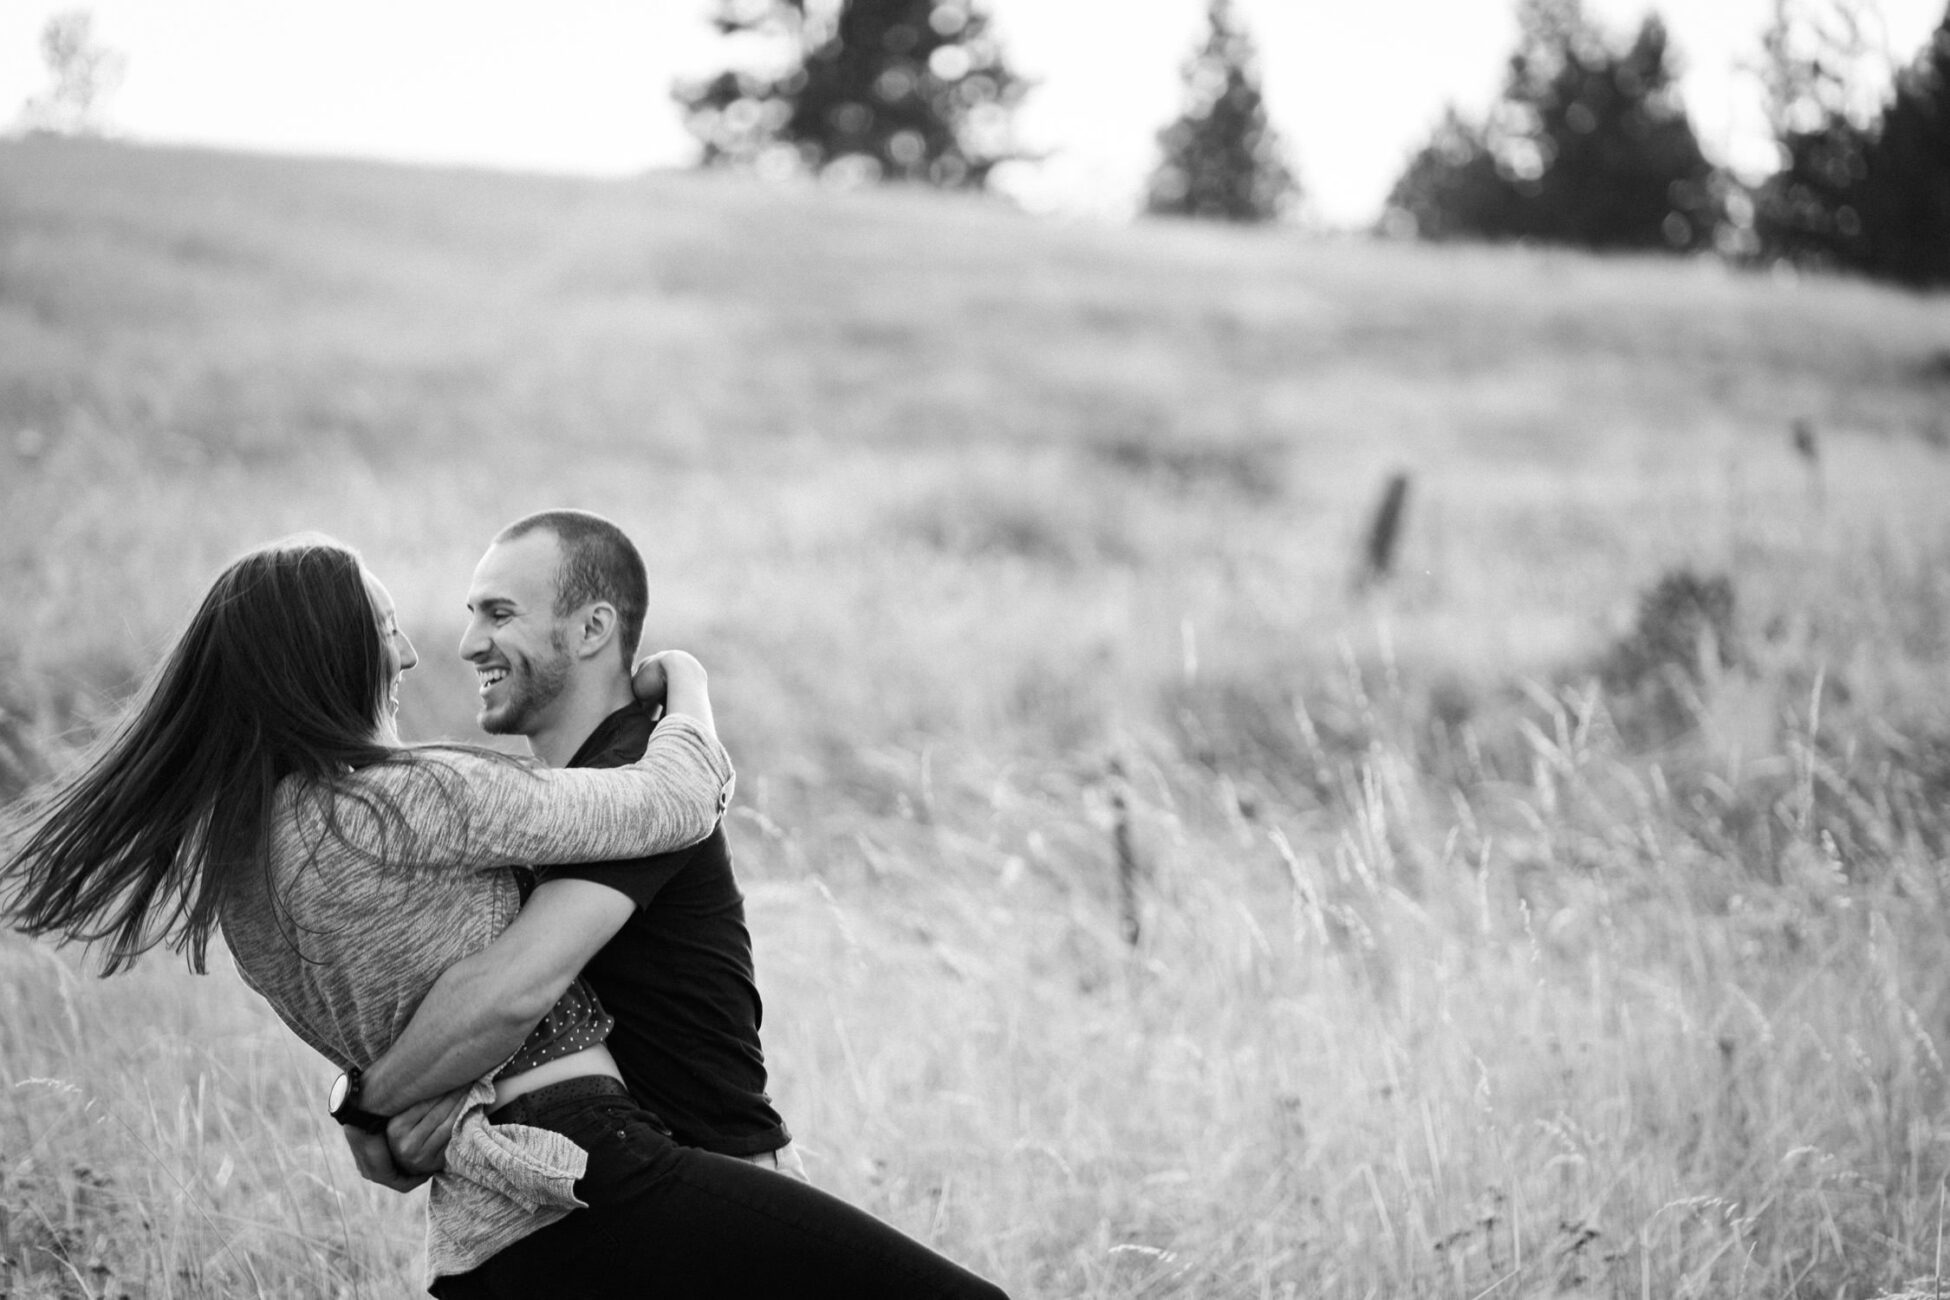 Hug spin laugh Engagement session Columbia River Gorge Oregon